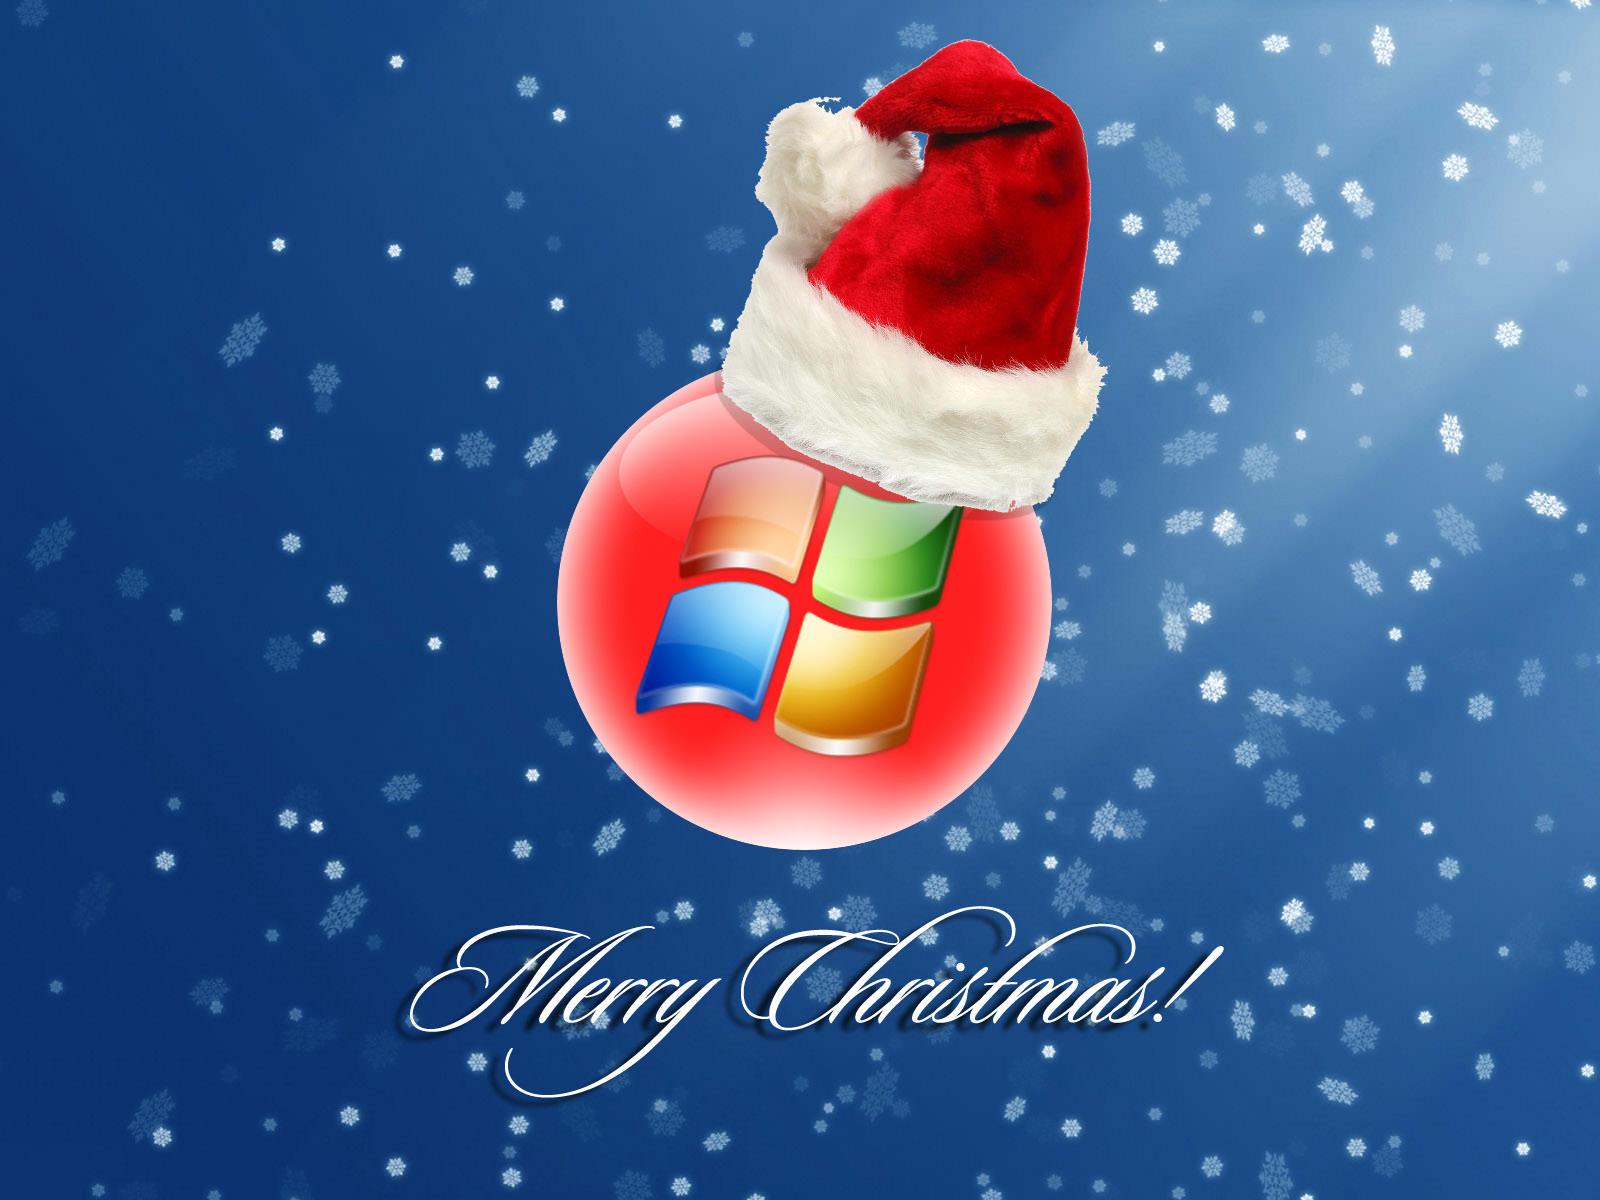 3d Xmas Tree Live Wallpaper 20 Beautiful Hd Christmas Desktop Wallpapers Freecreatives